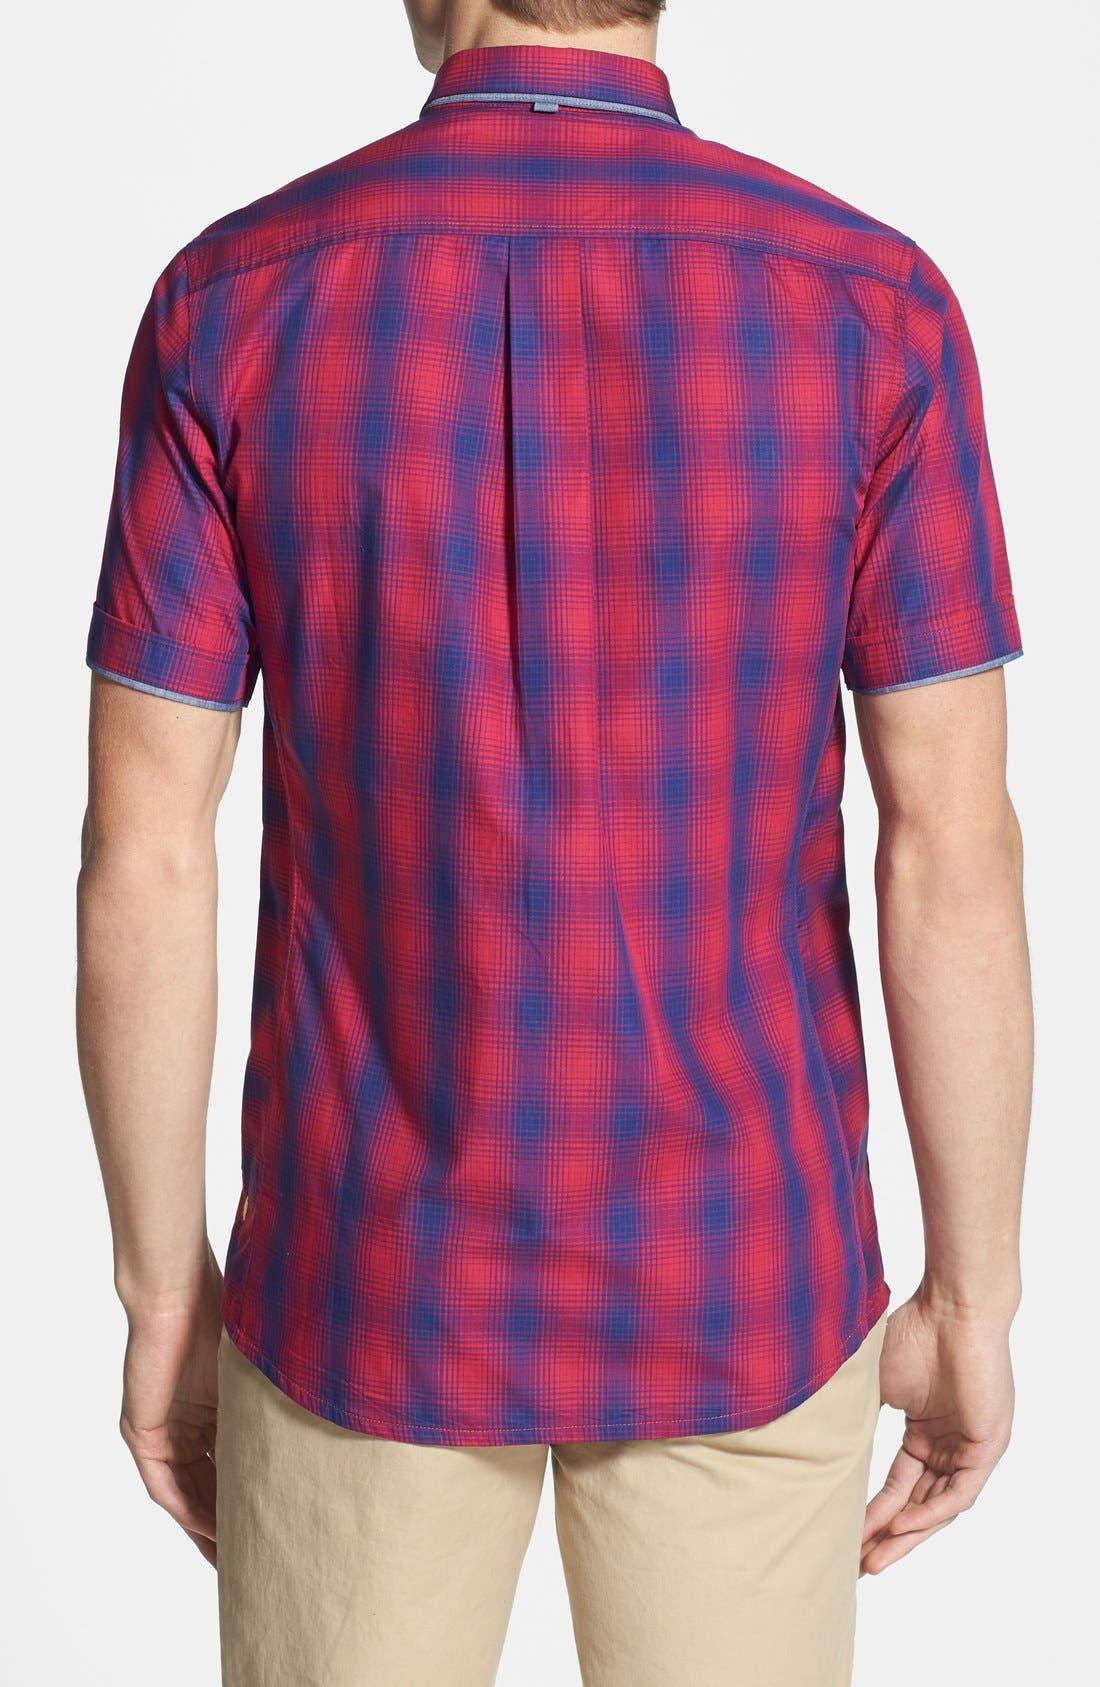 Alternate Image 3  - Descendant of Thieves Ombré Short Sleeve Plaid Shirt